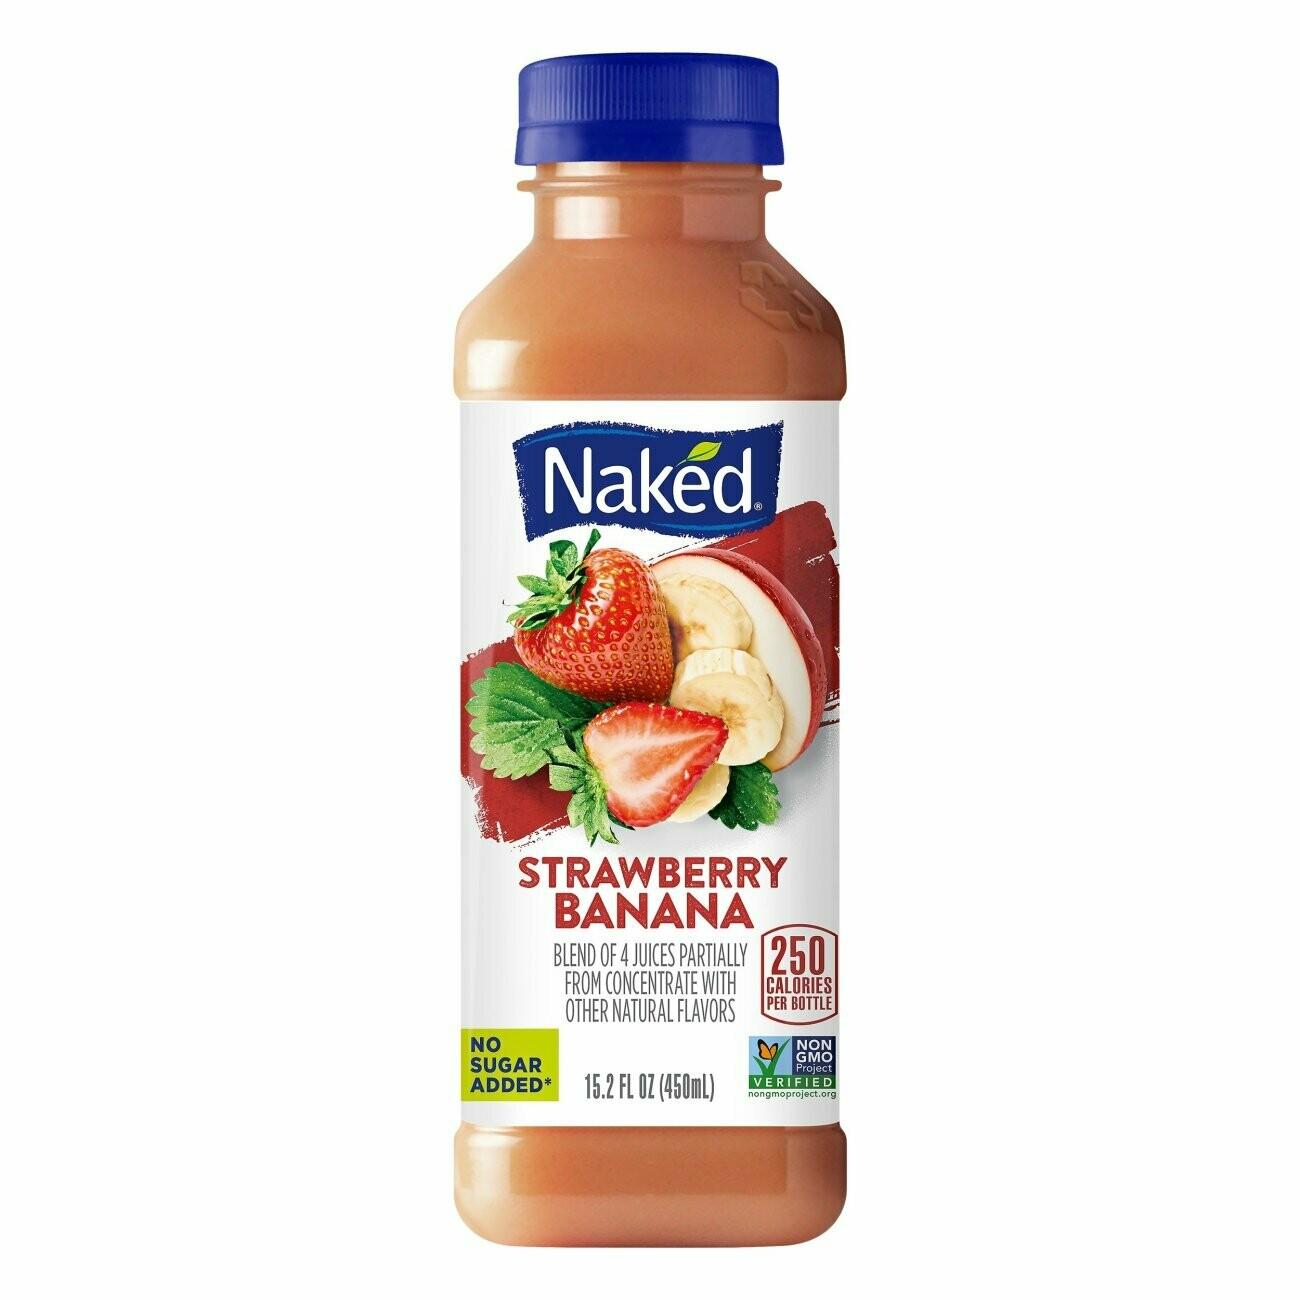 Naked Strawberry Banana 15.2oz